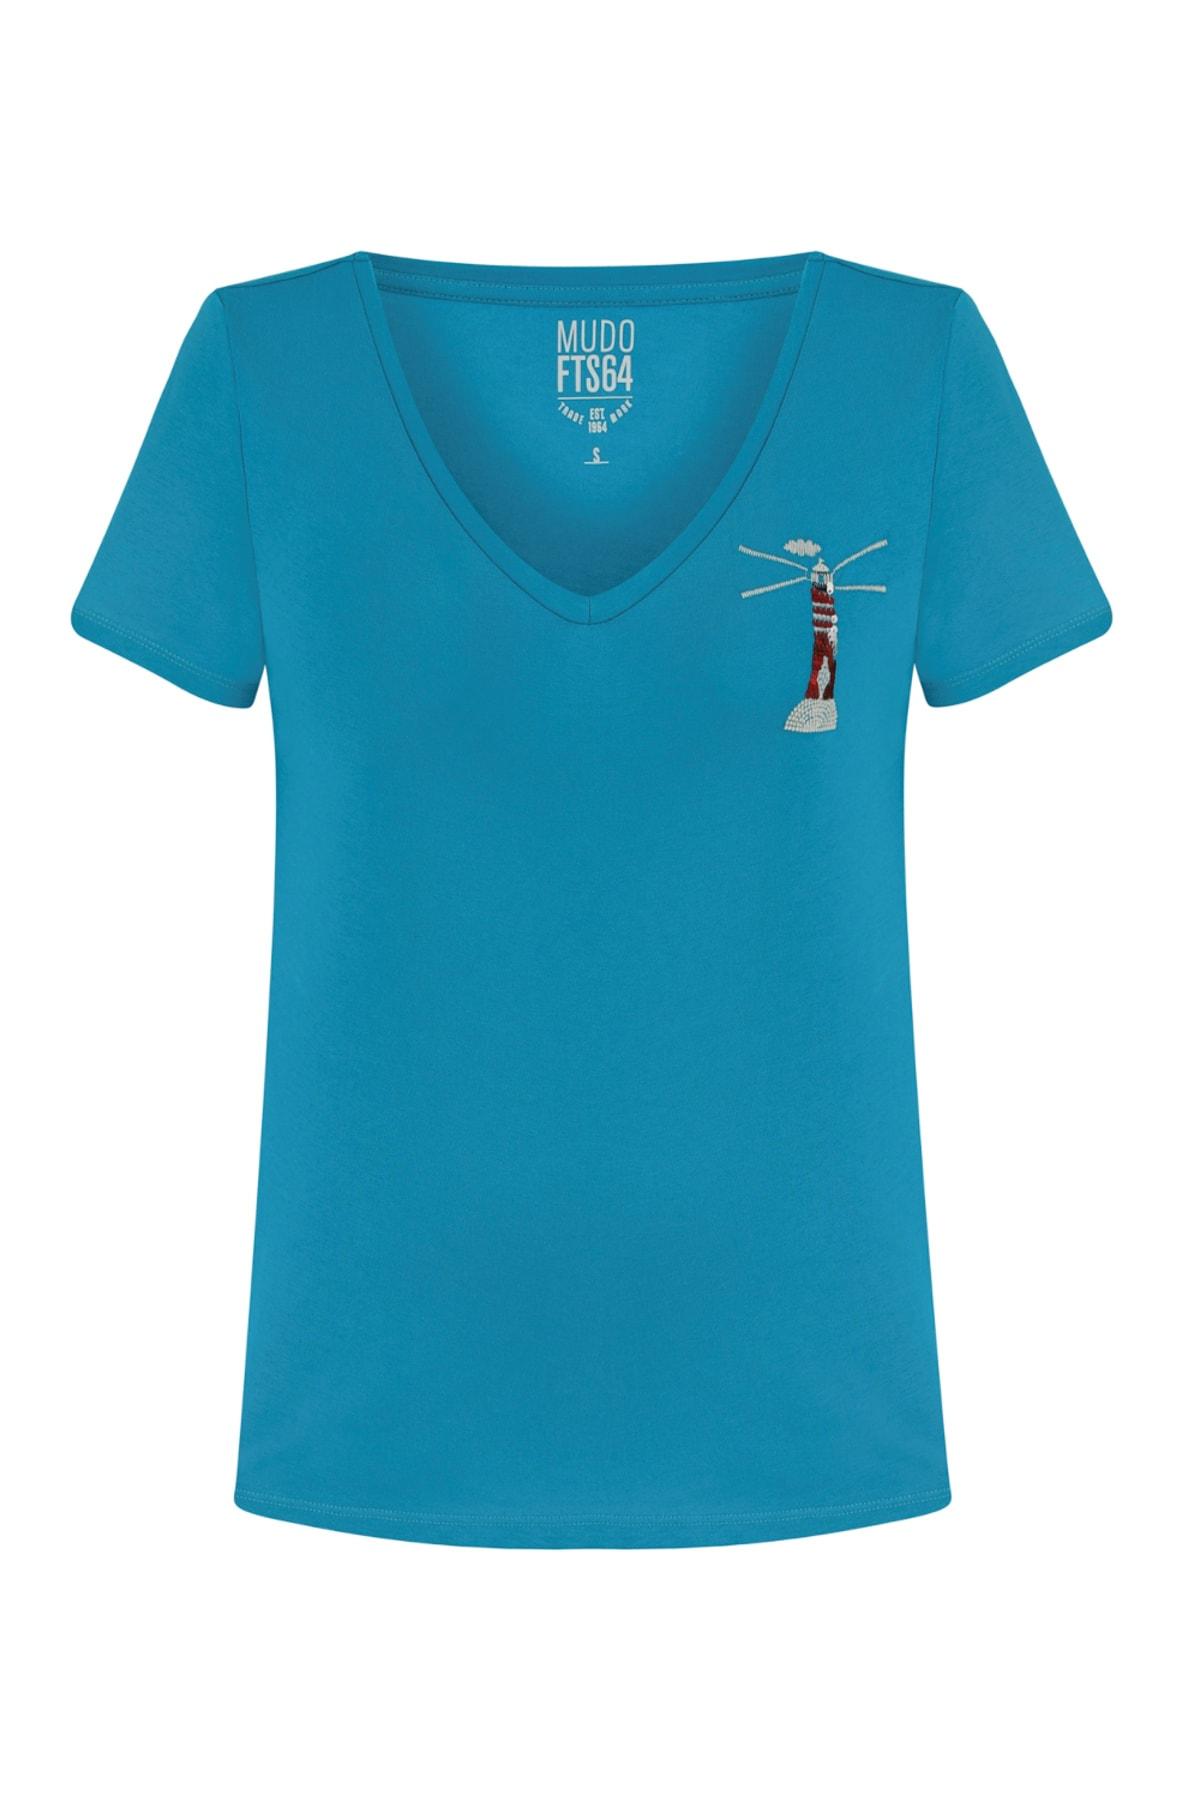 Mudo Kadın Mavi V Yaka Pul İşlemeli Pamuk T-Shırt 380299 1